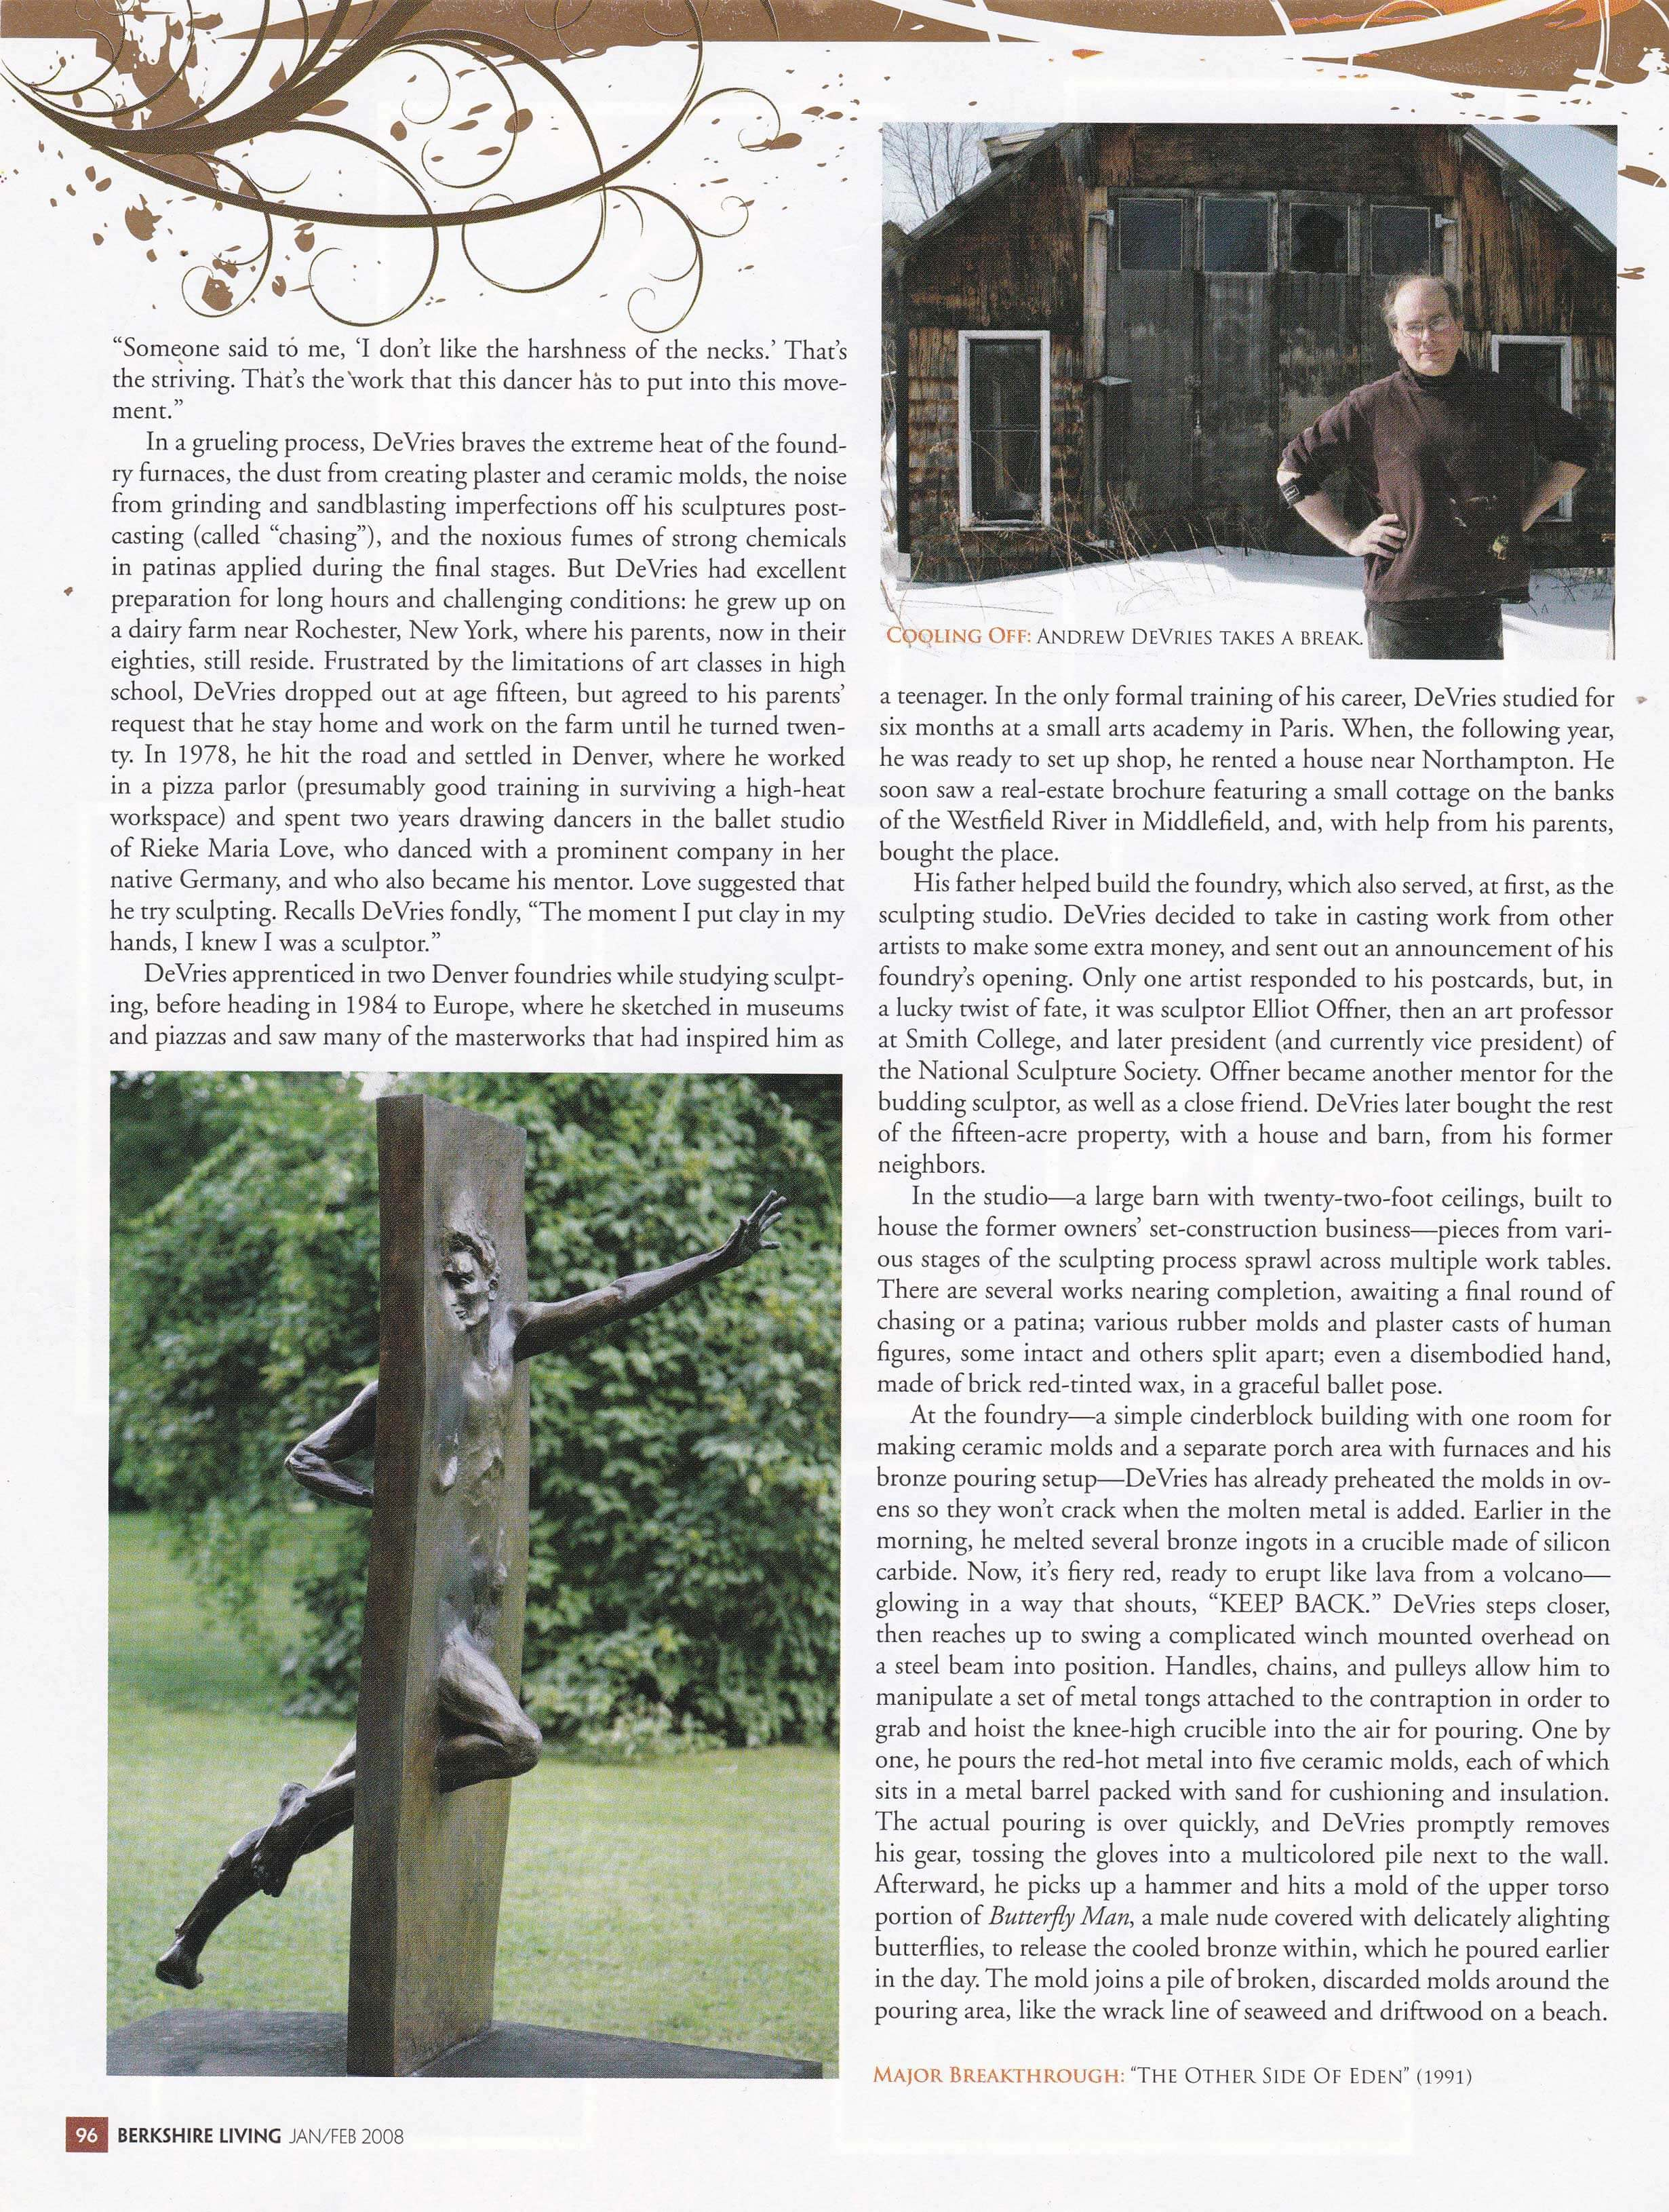 Berkshire Living Magazine January/February 2008 page 96